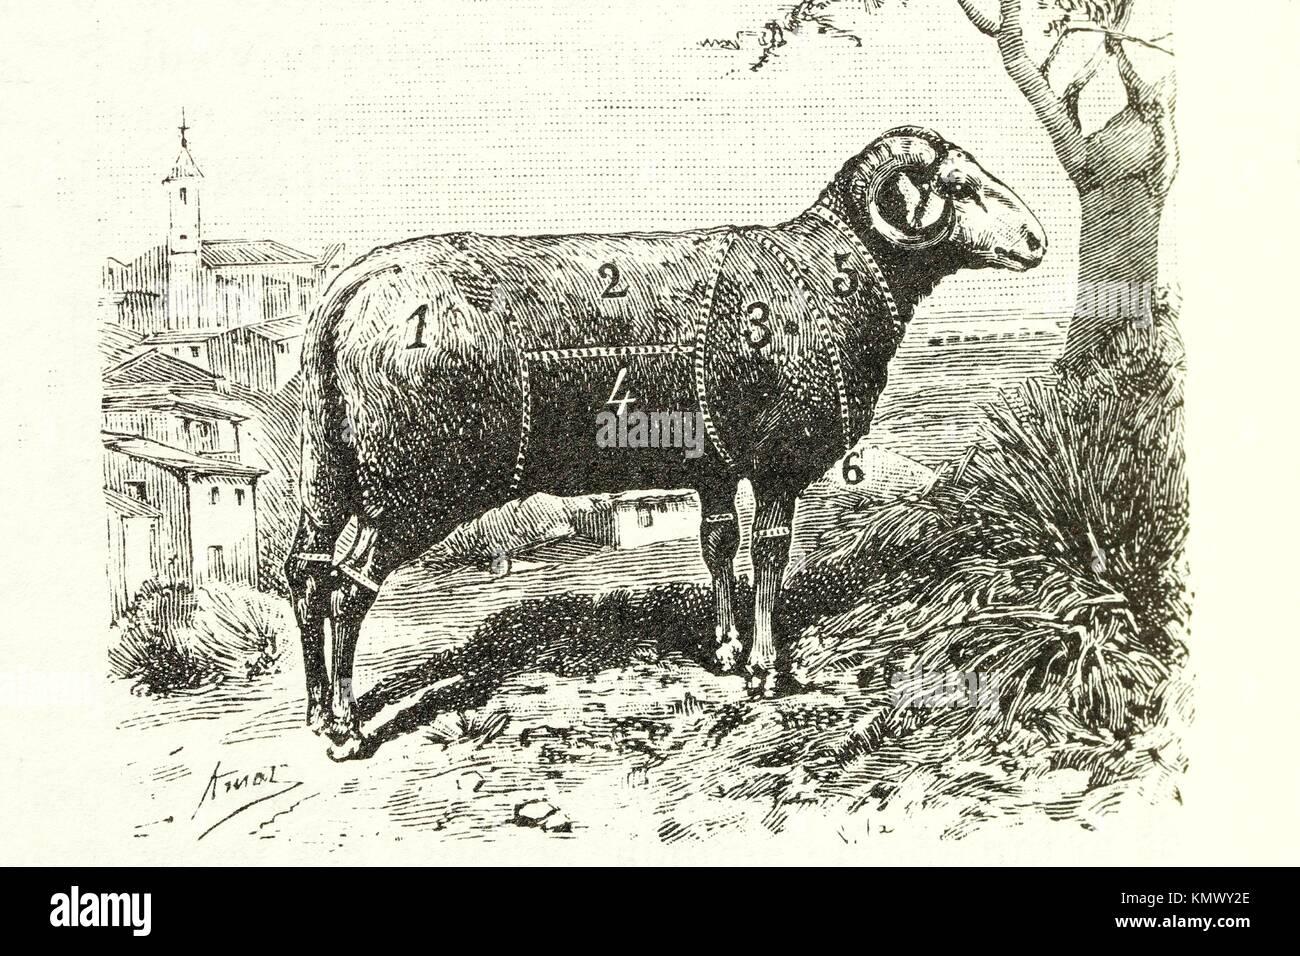 Mutton Antique illustration 1892 - Stock Image